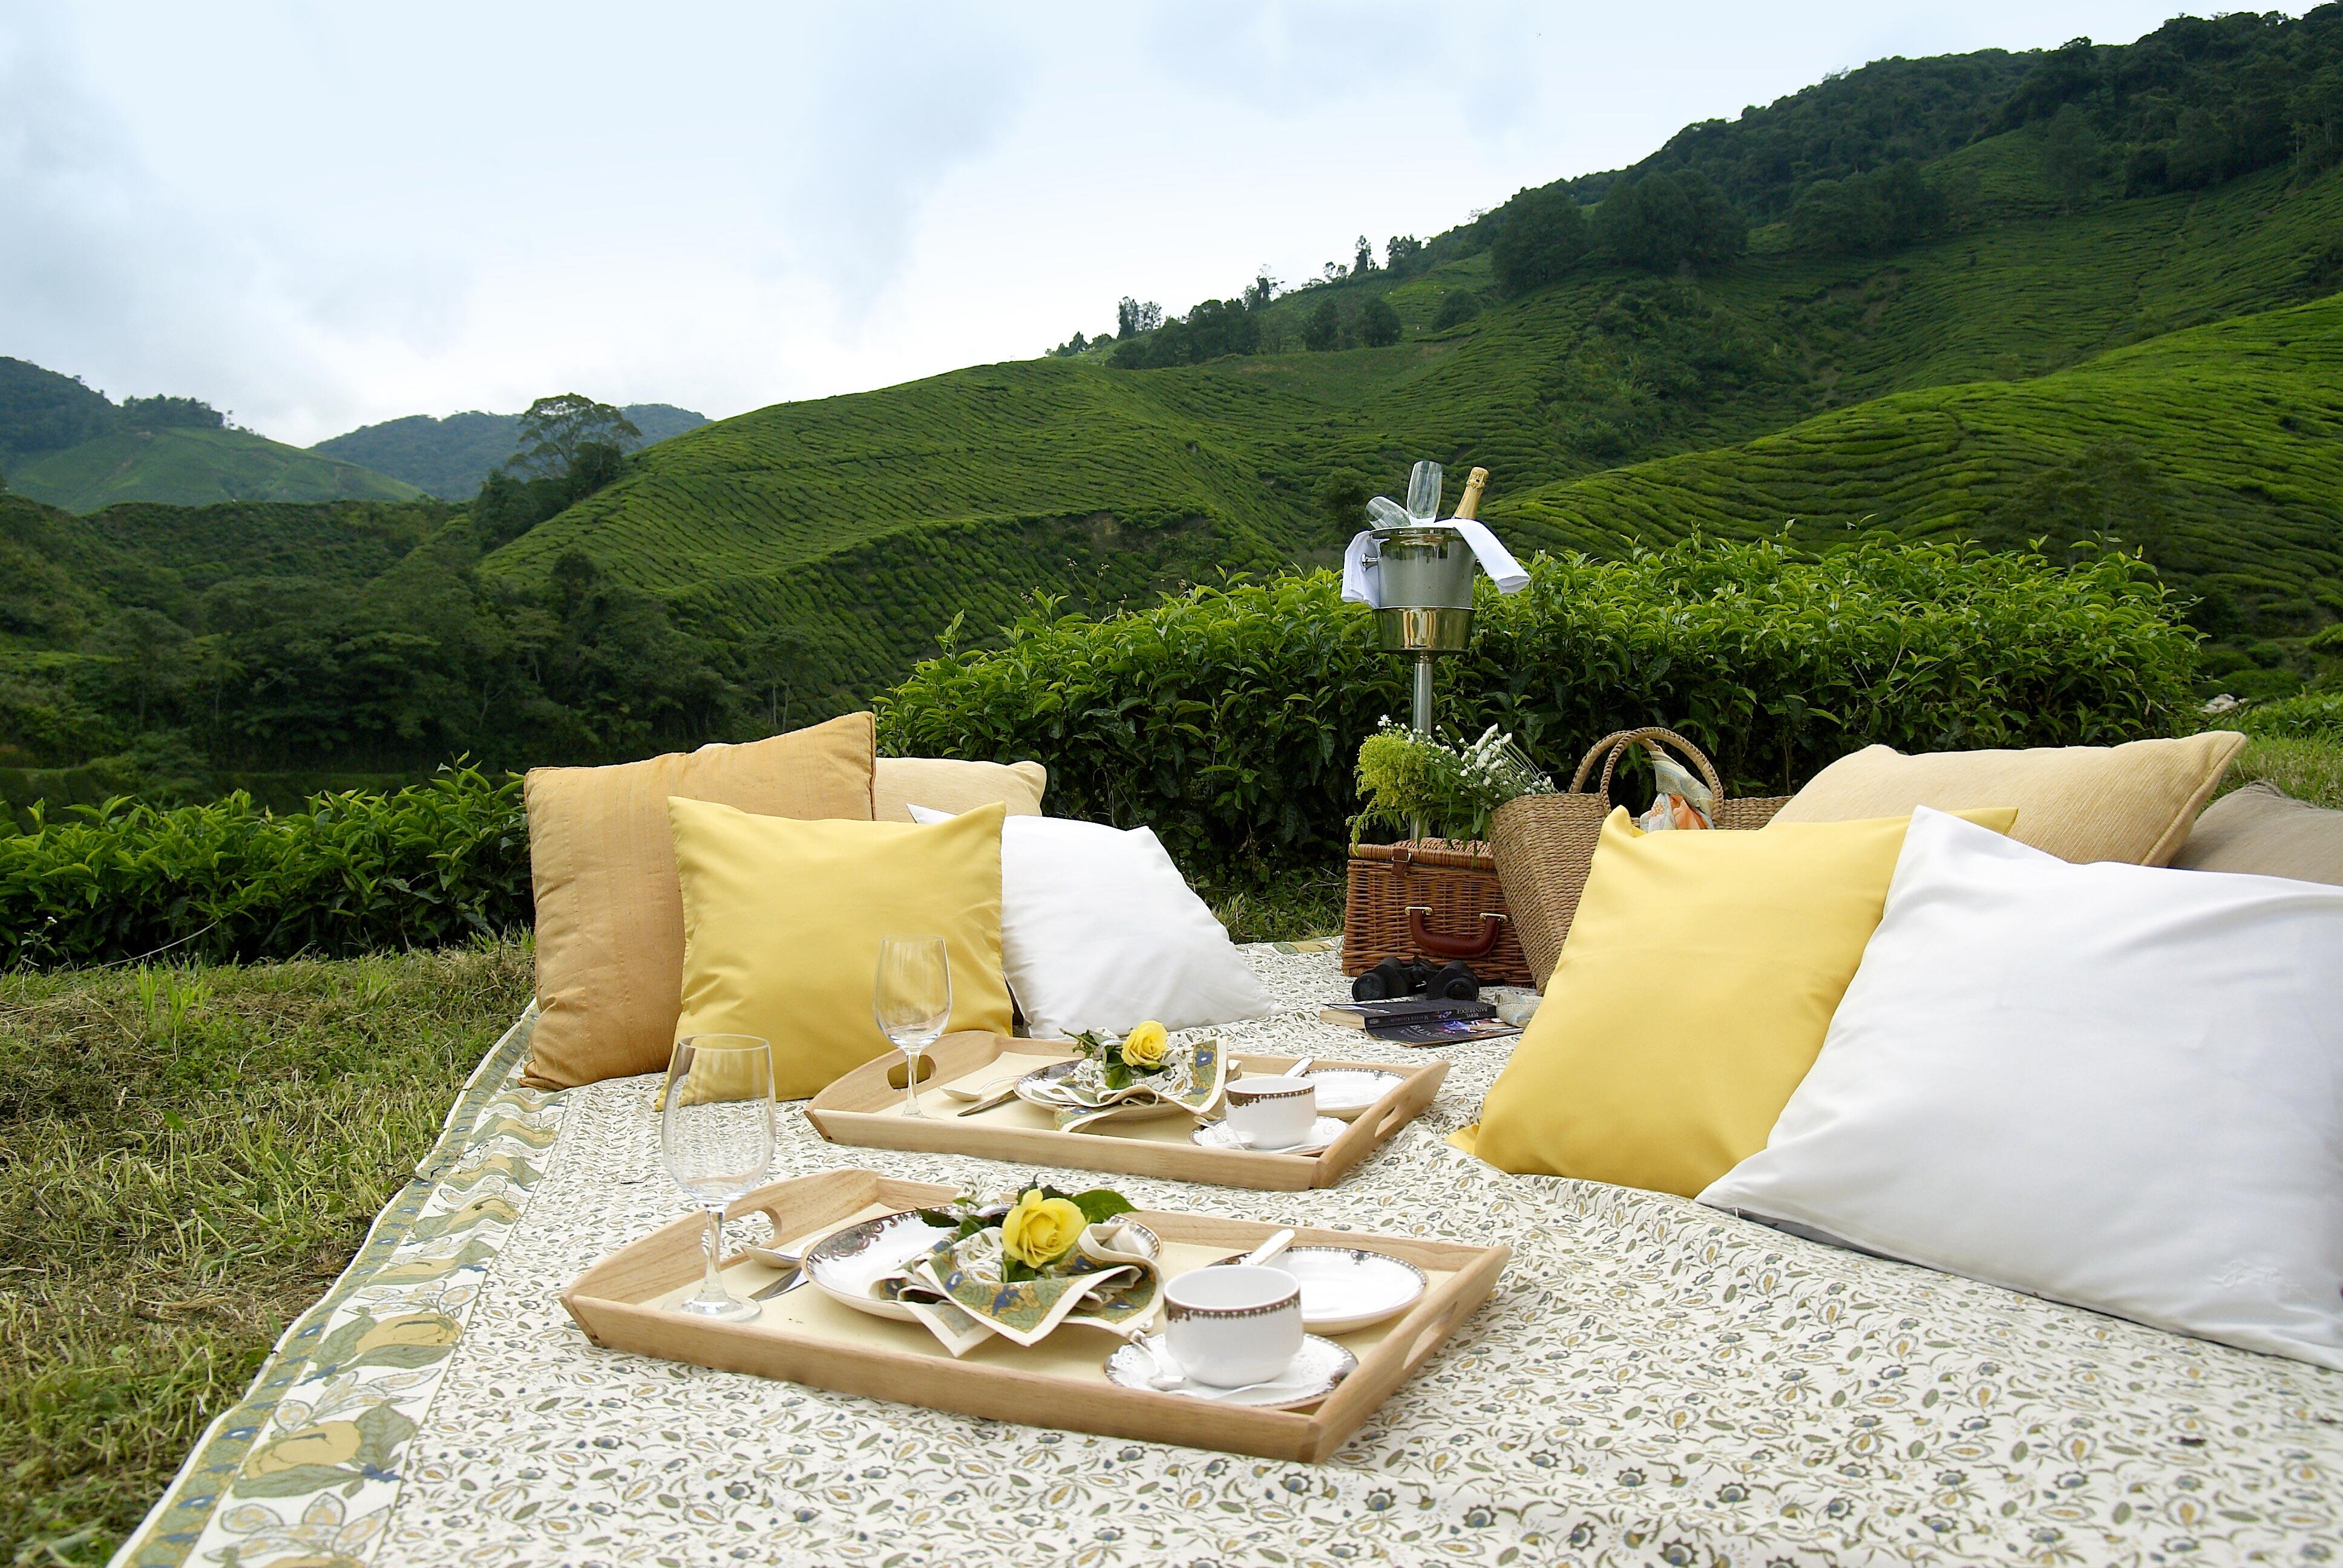 lifestyle town spectacular spots romantic picnic